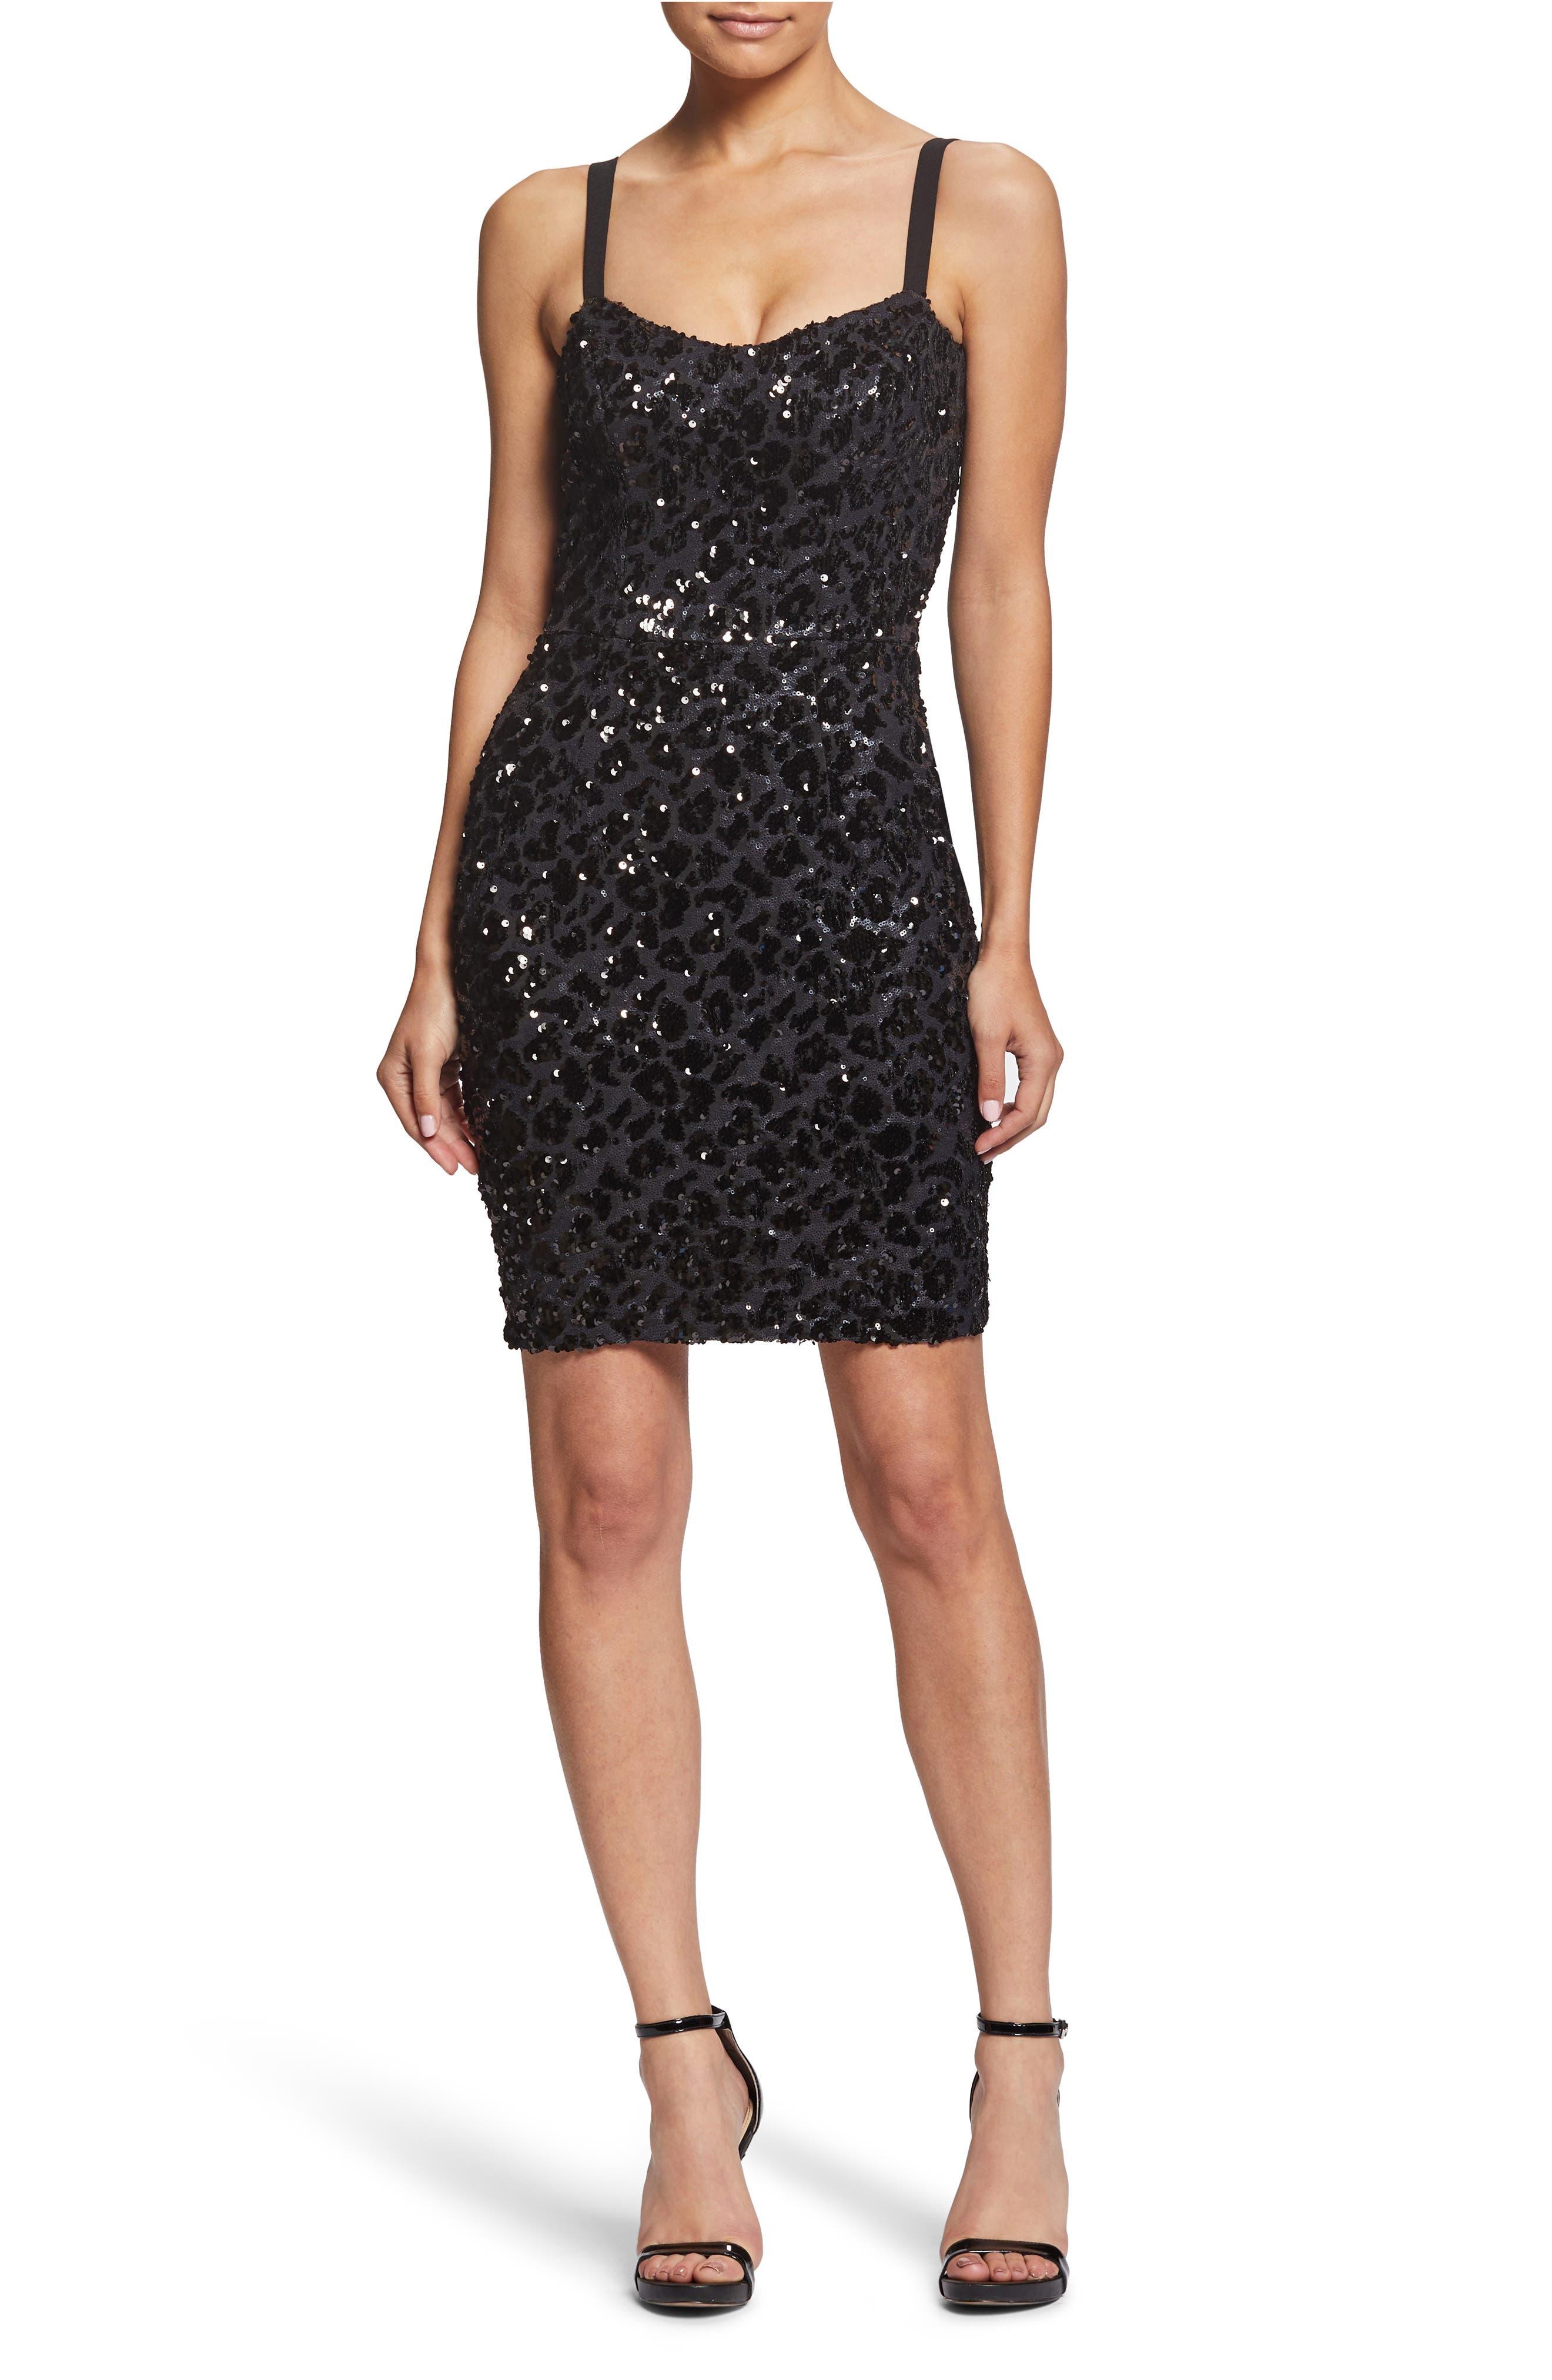 Dress The Population Lindsay Sequin Cheetah Cocktail Sheath Dress, Black